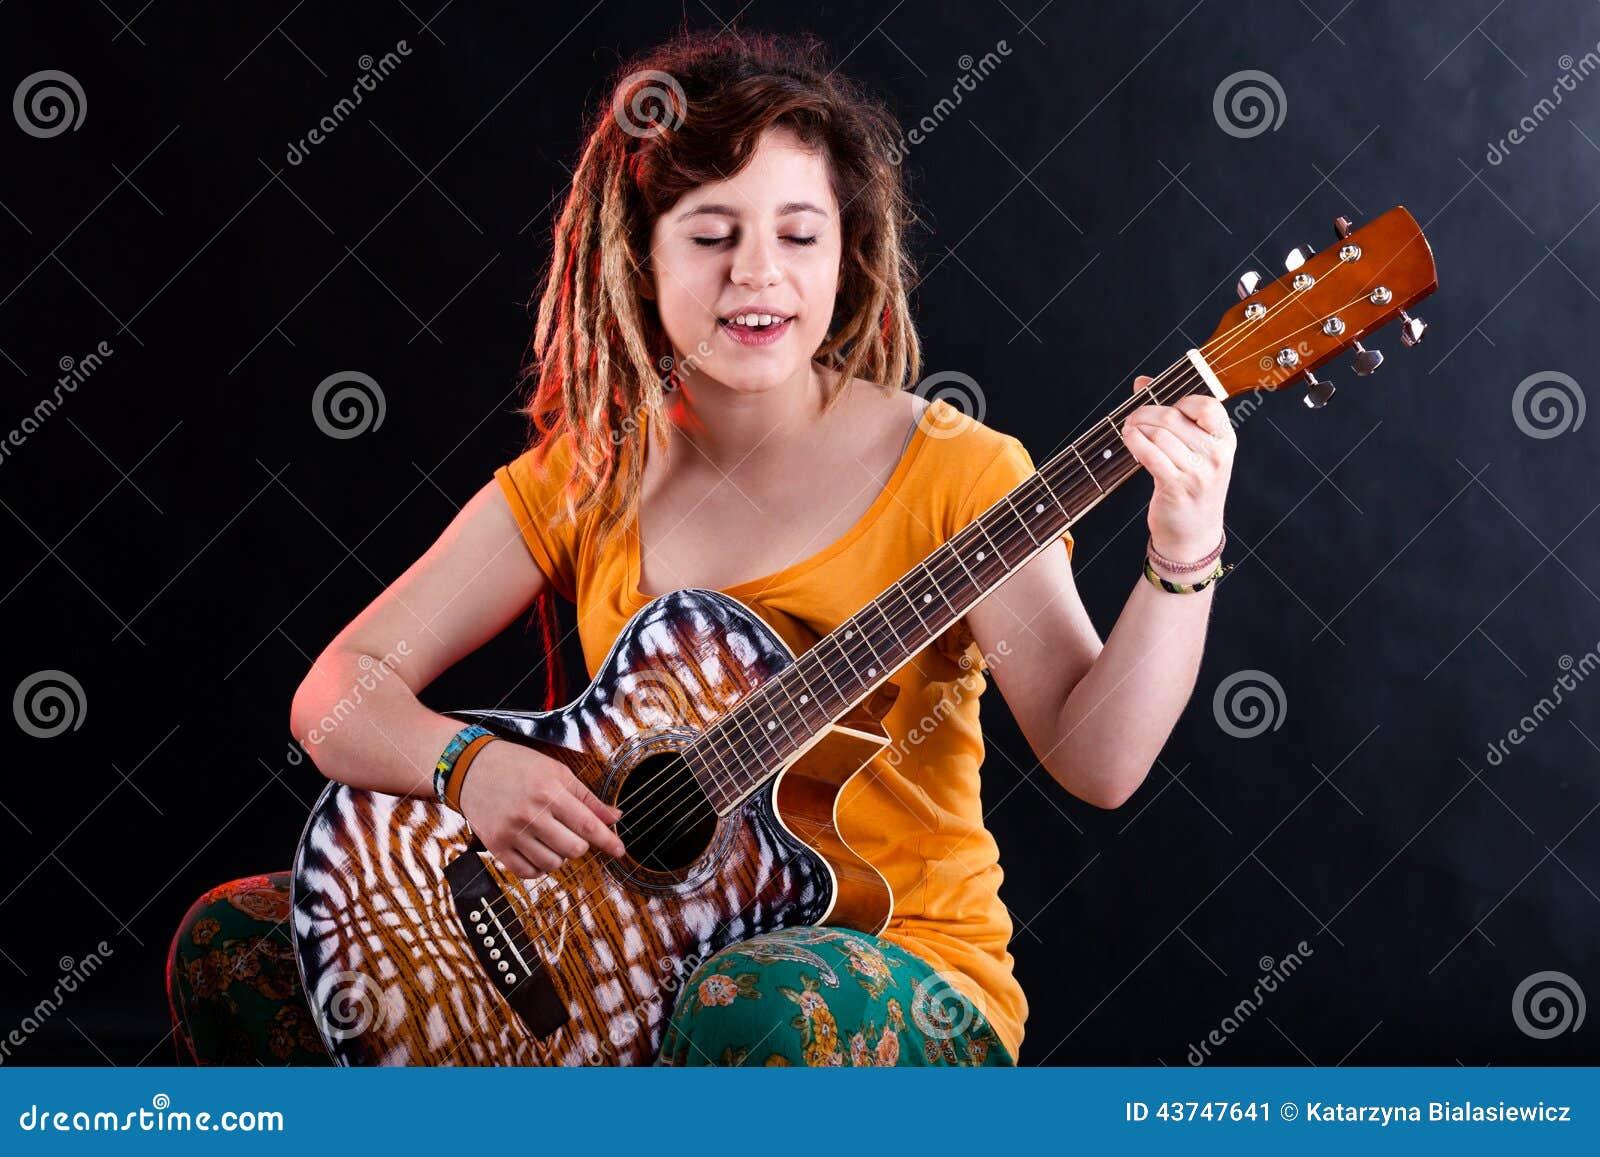 Teenage Girl Singing And Playing Guitar Stock Image - Image Of Instrument, Black 43747641-8527